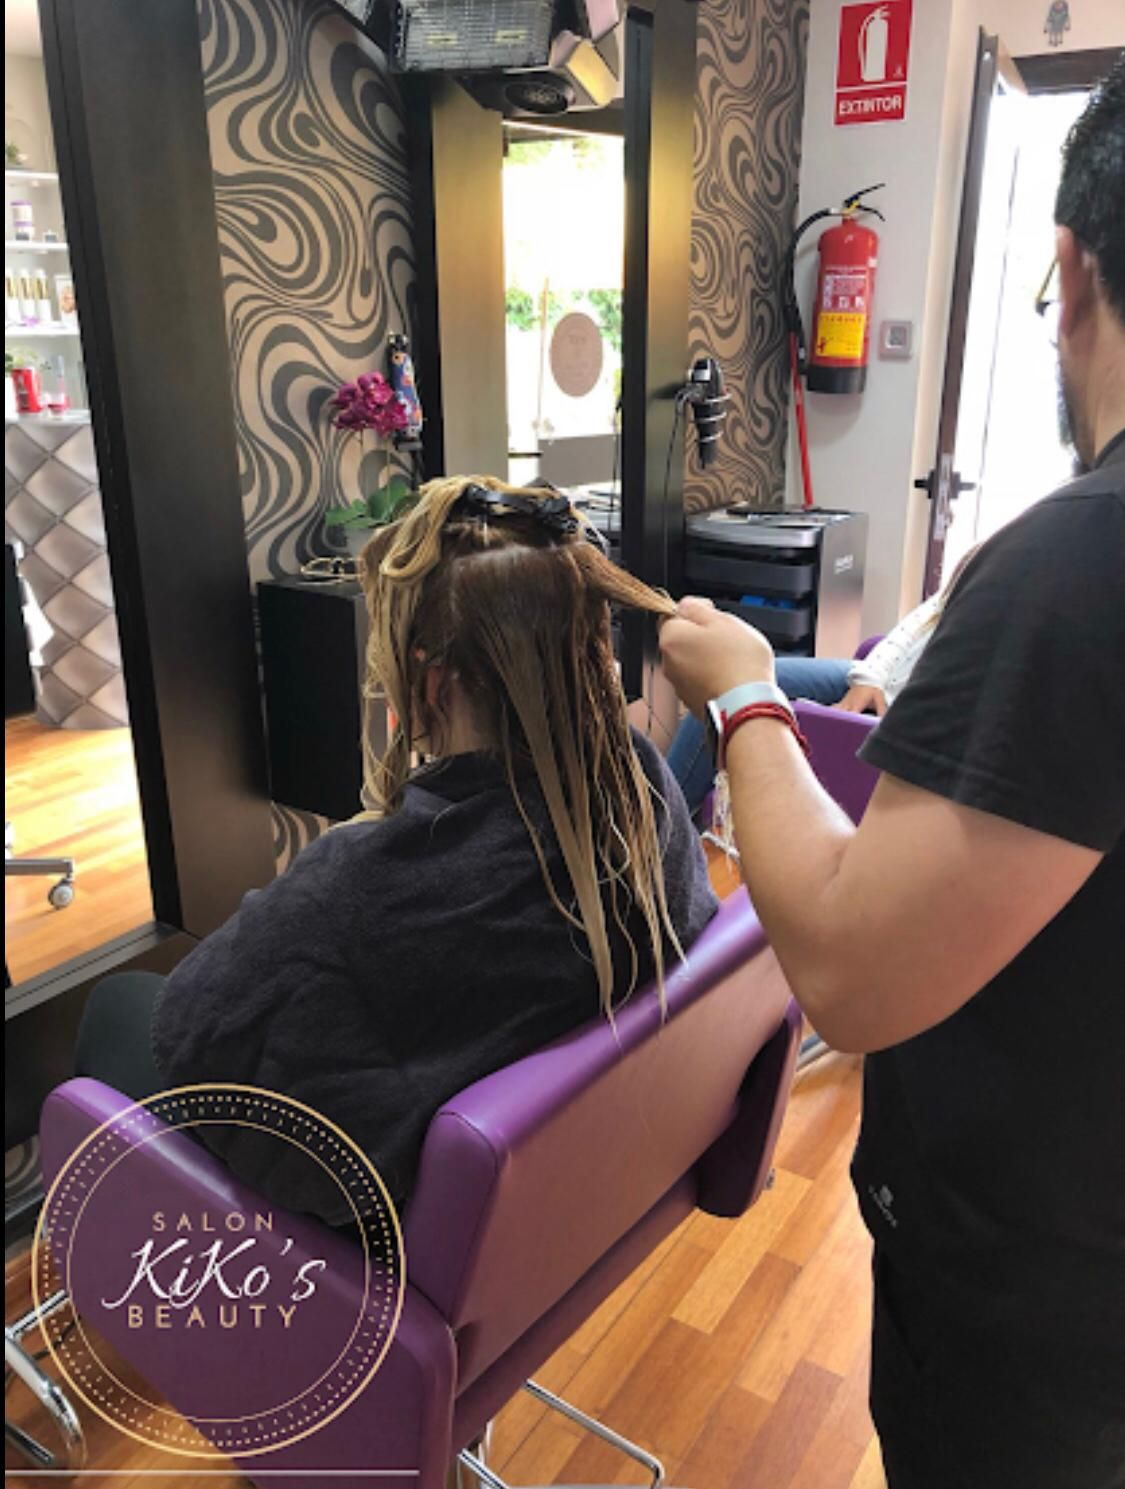 Hair botox treatment in Marbella